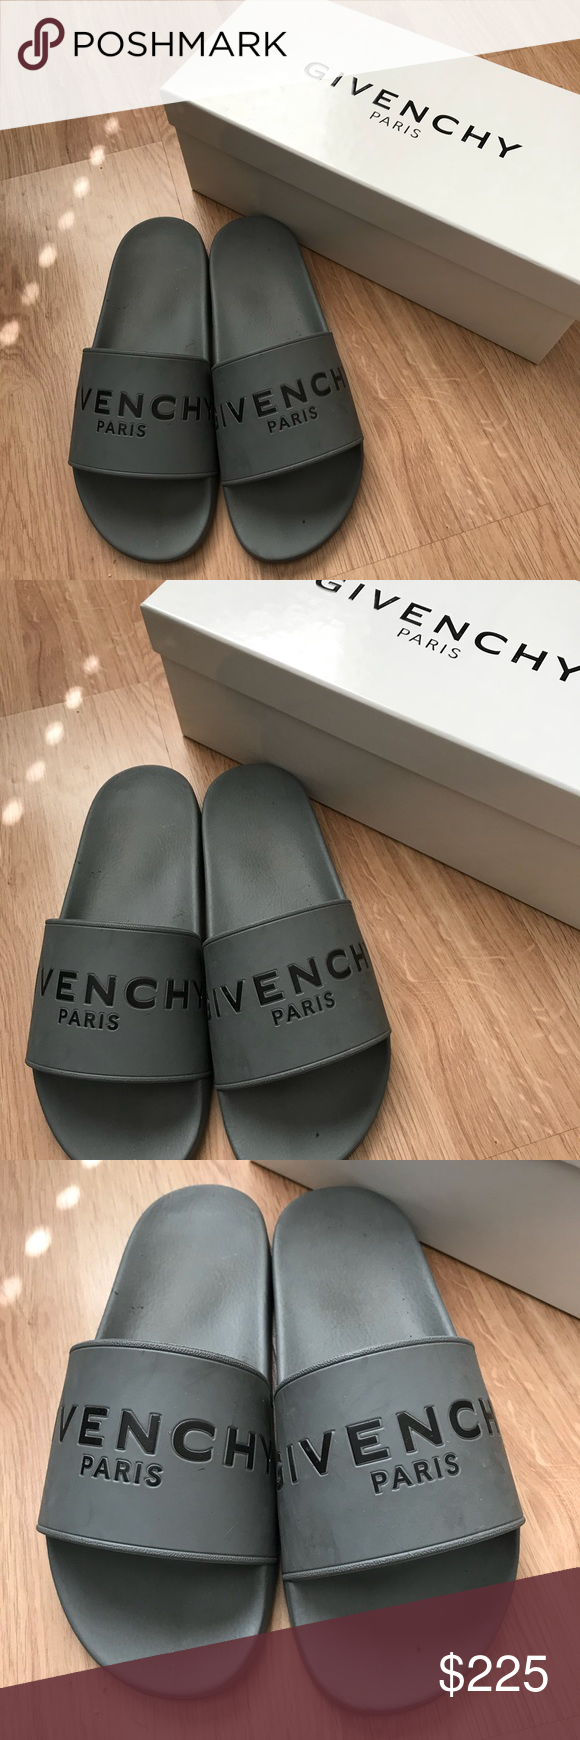 Men S Givenchy Slides Givenchy Shoes Givenchy Givenchy Slides